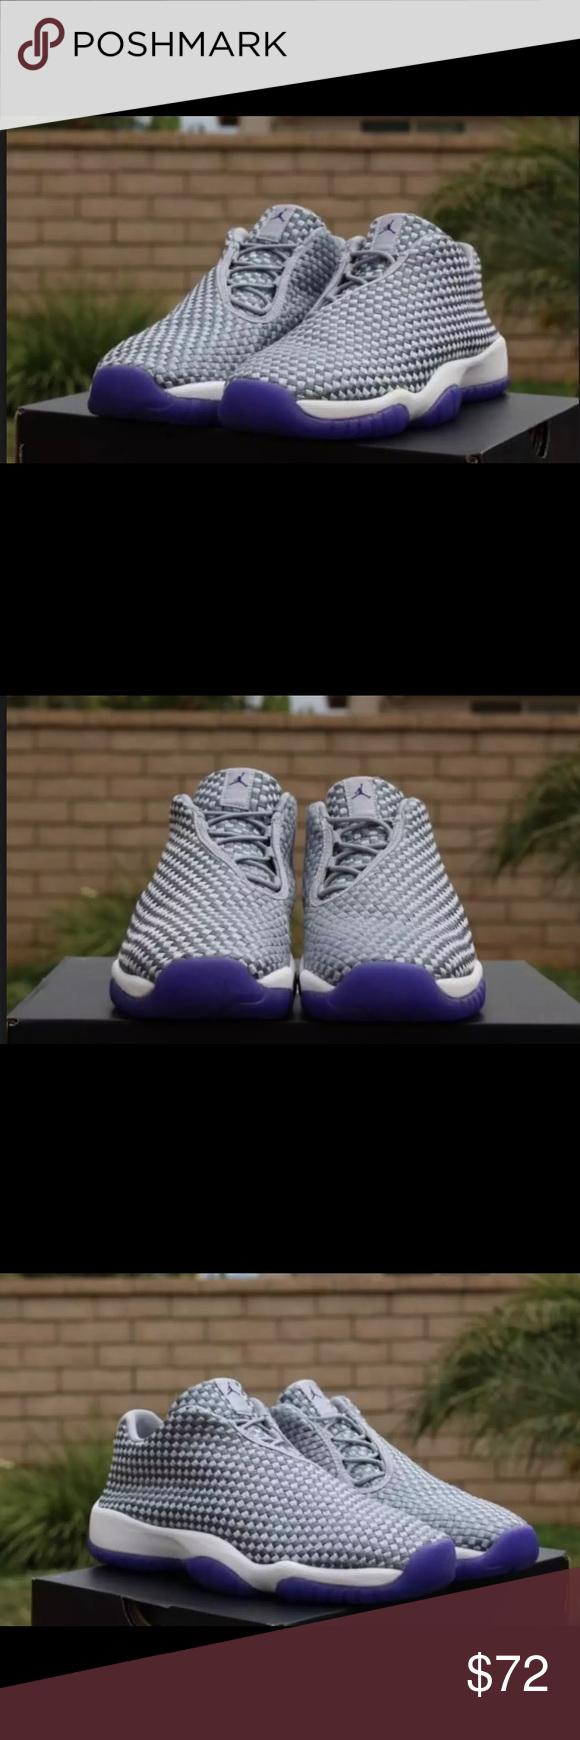 5206982c09c7 Air Jordan Future Low Girls Shoes Wolf Grey Purple Brand New but no box  Ships same